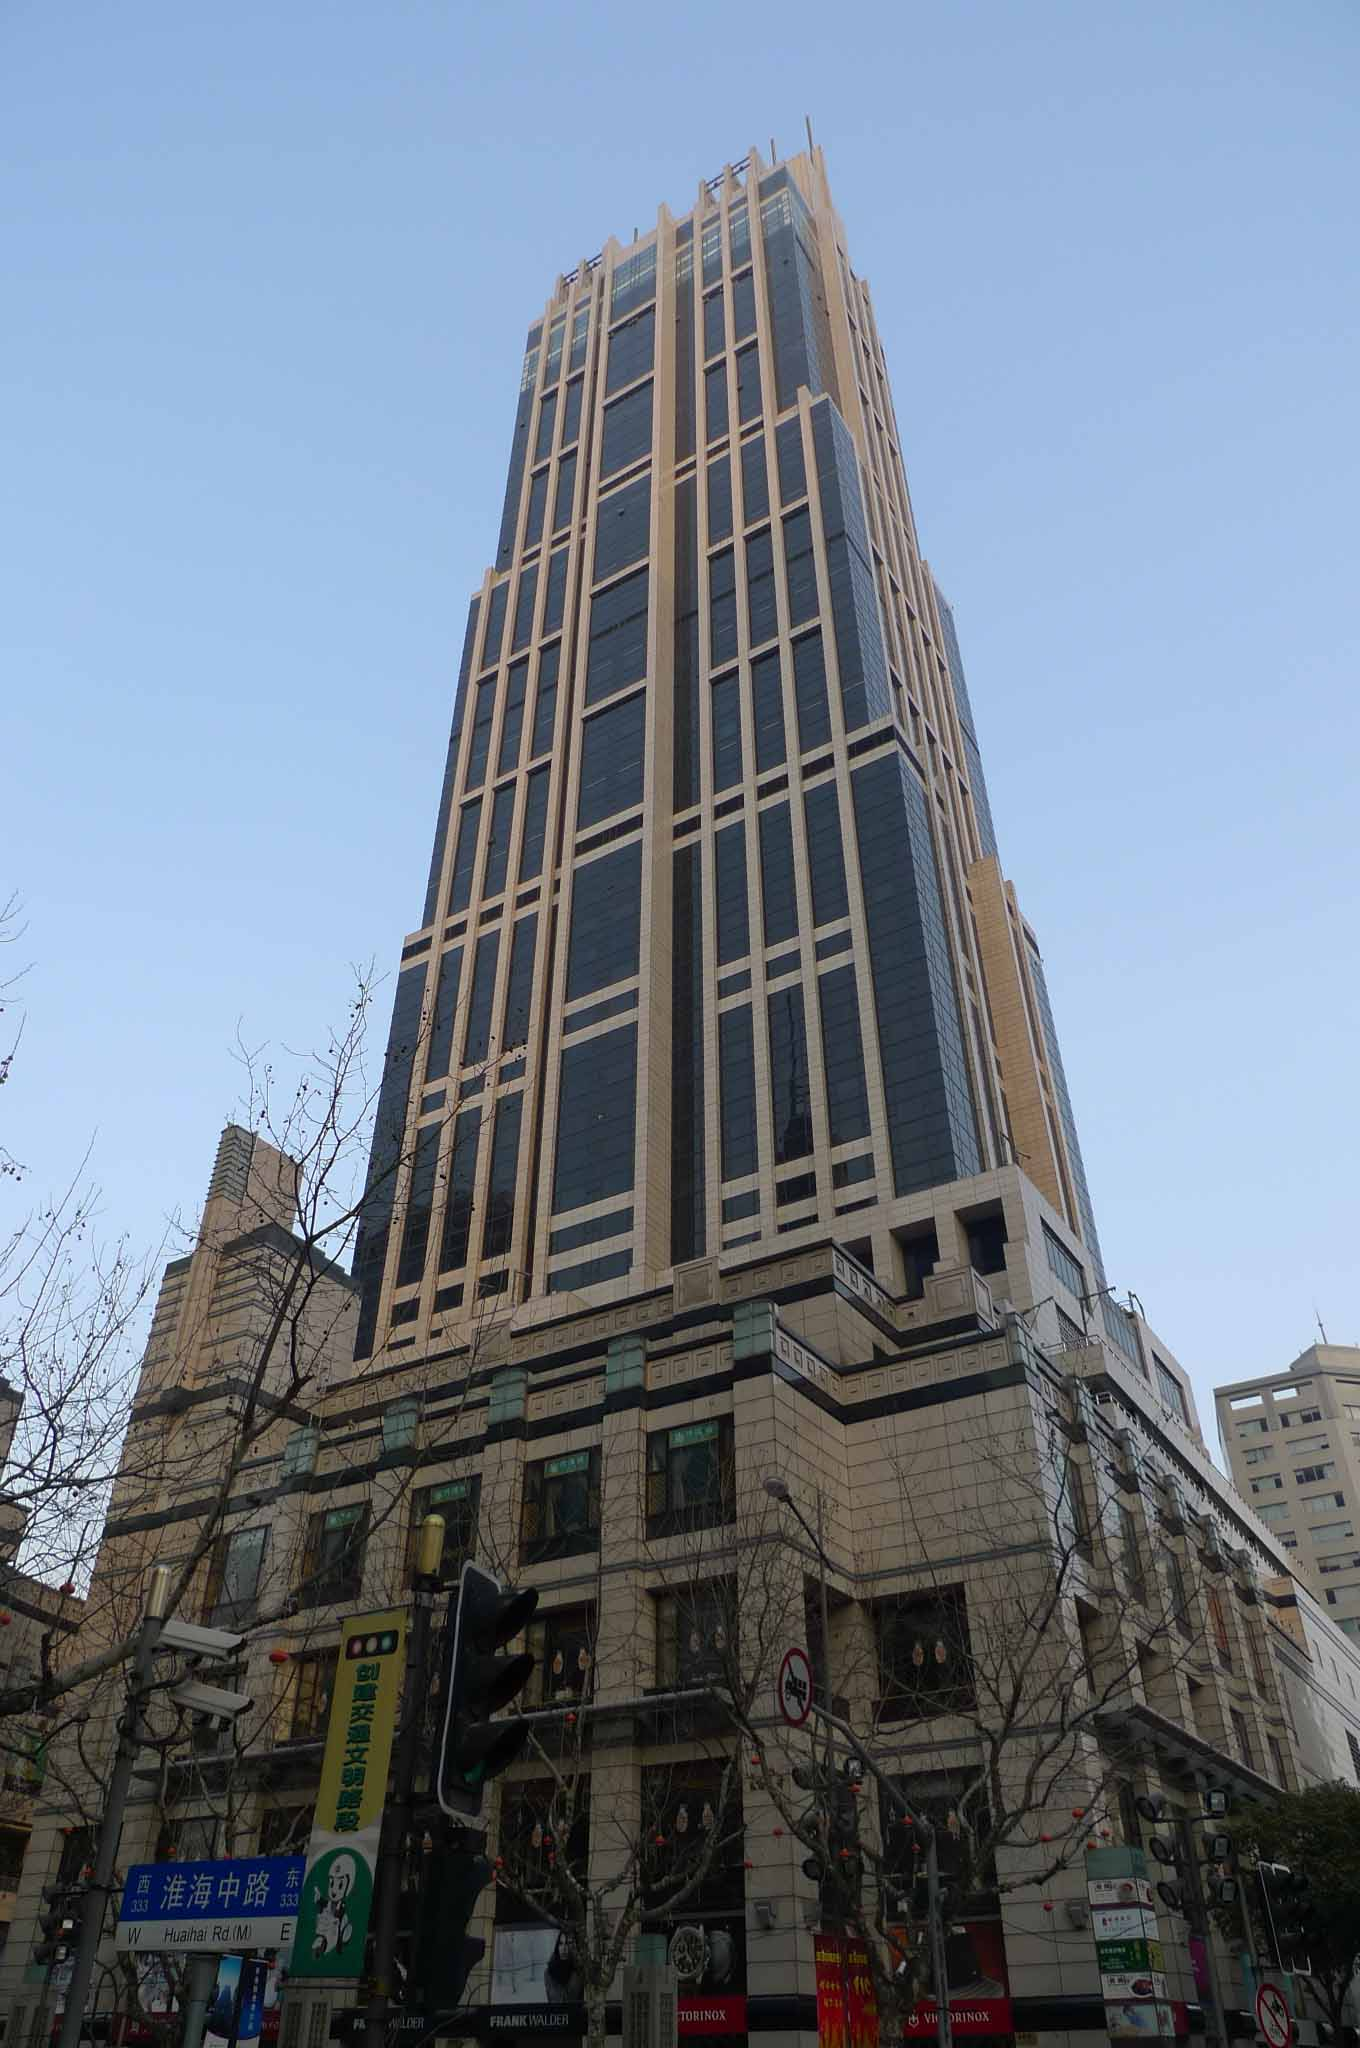 ArtDeco 现代 都市 高层 建筑的经典 风格 深图片